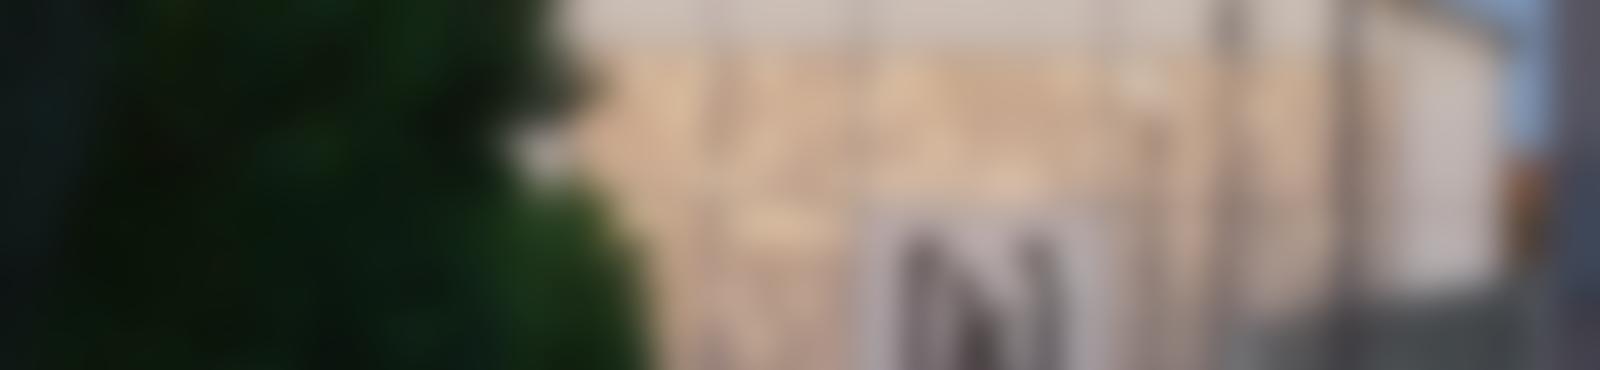 Blurred 1cec673b b208 45e7 9140 5389642765d0